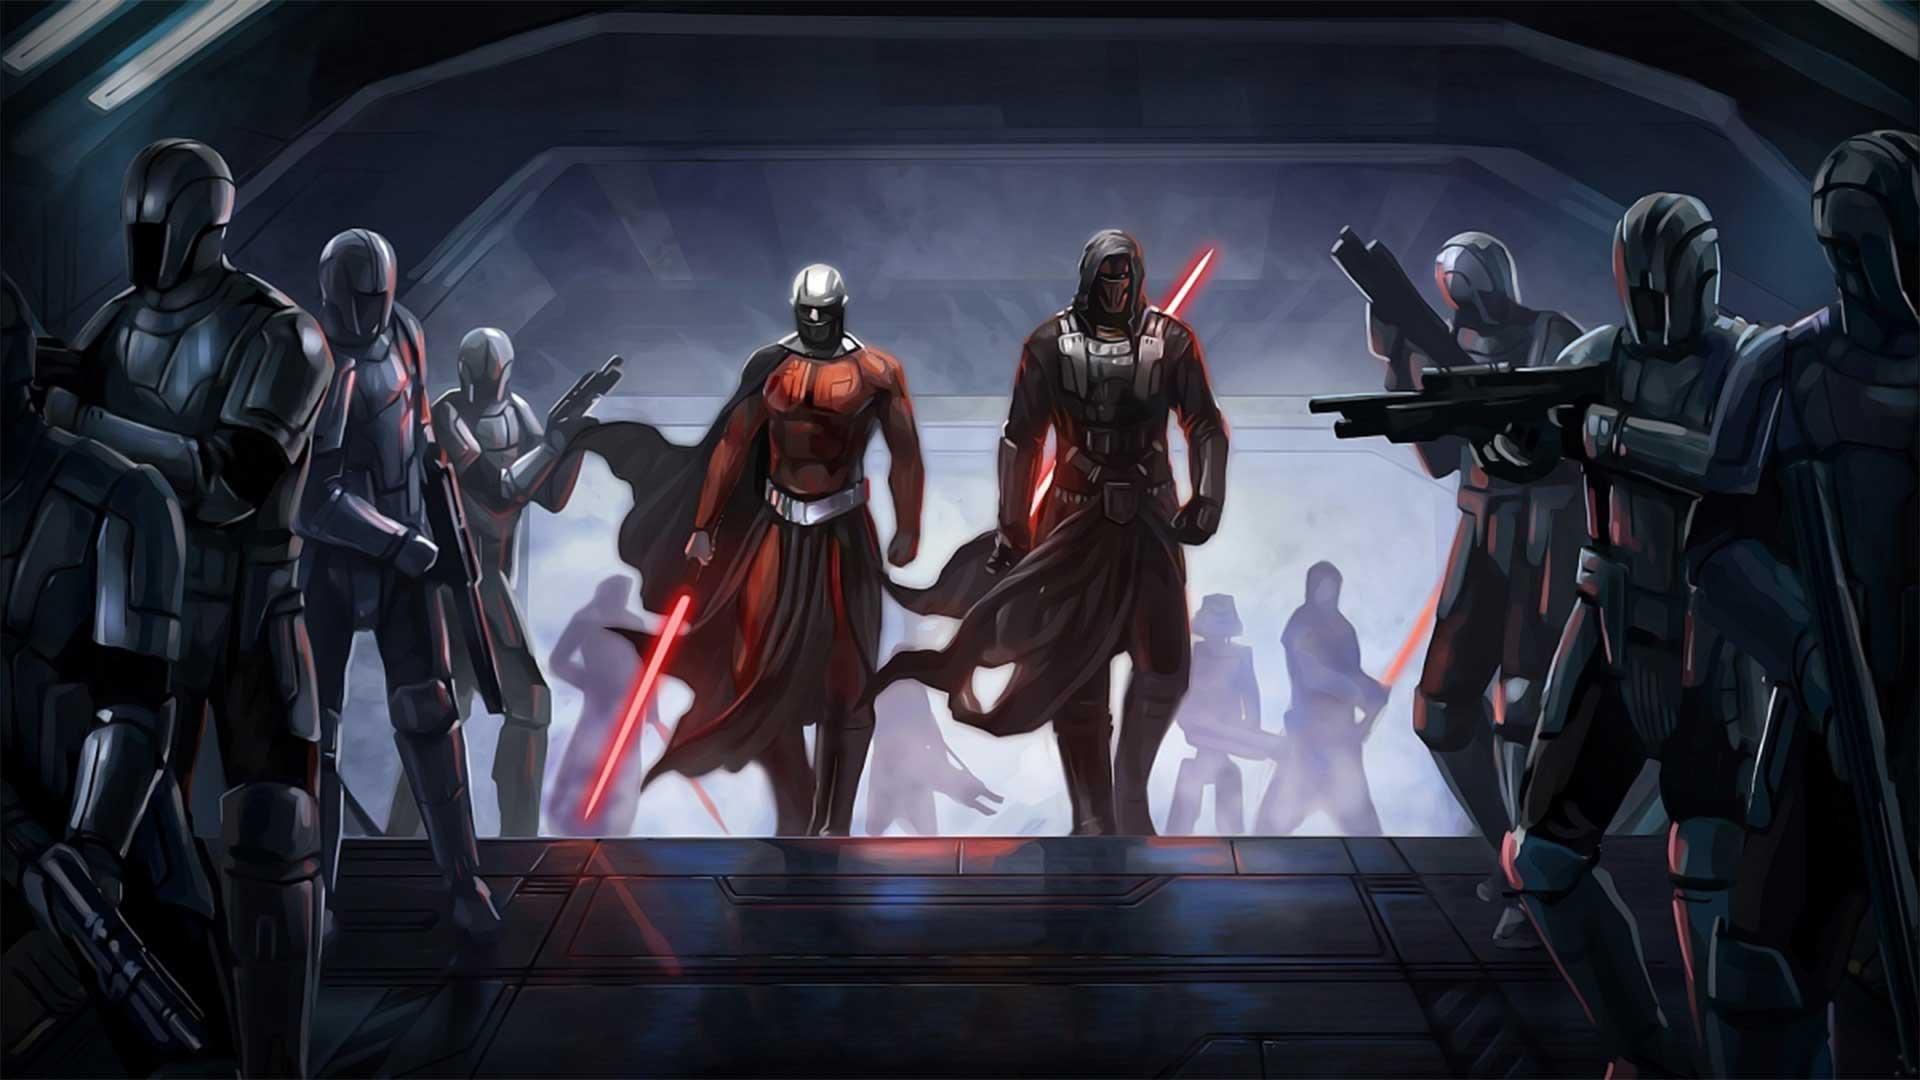 Star Wars: Knights of the Old Republic находится в разработке